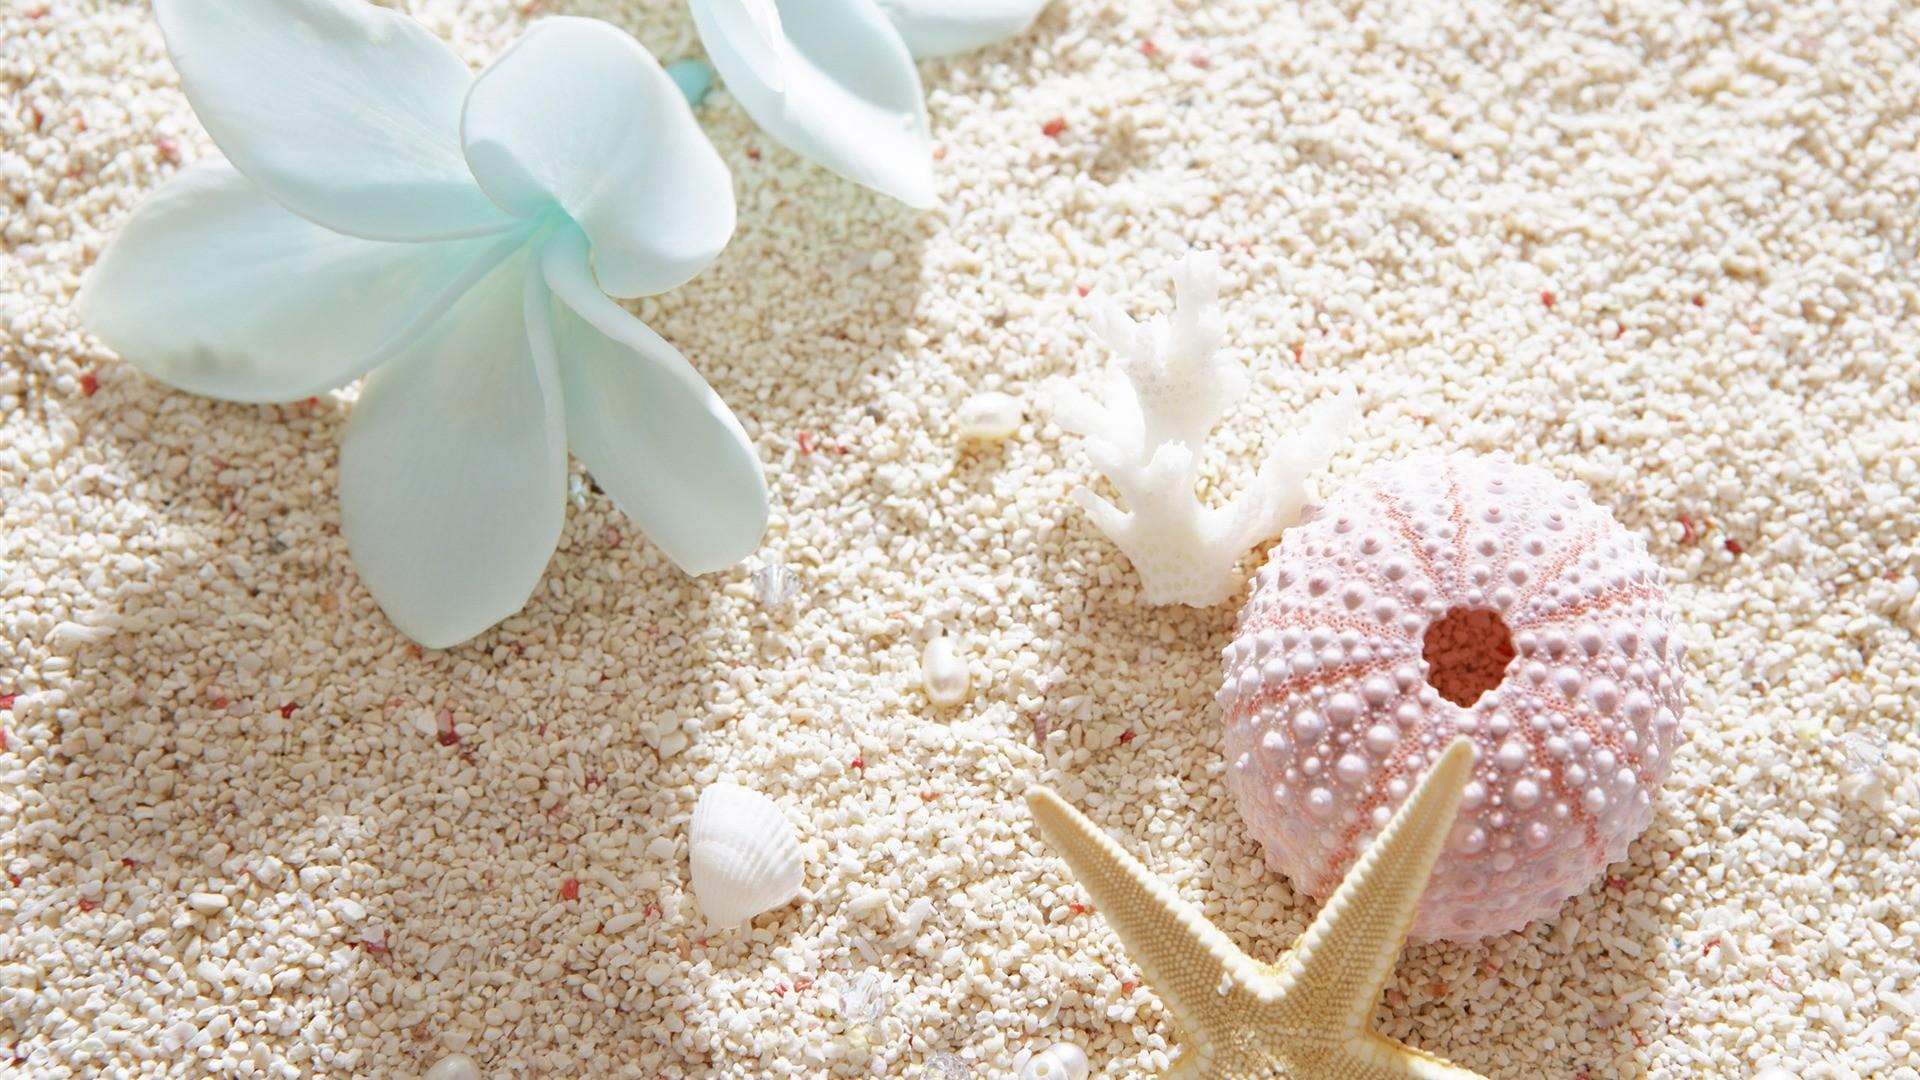 Seashell Desktop Wallpaper (54+ Images